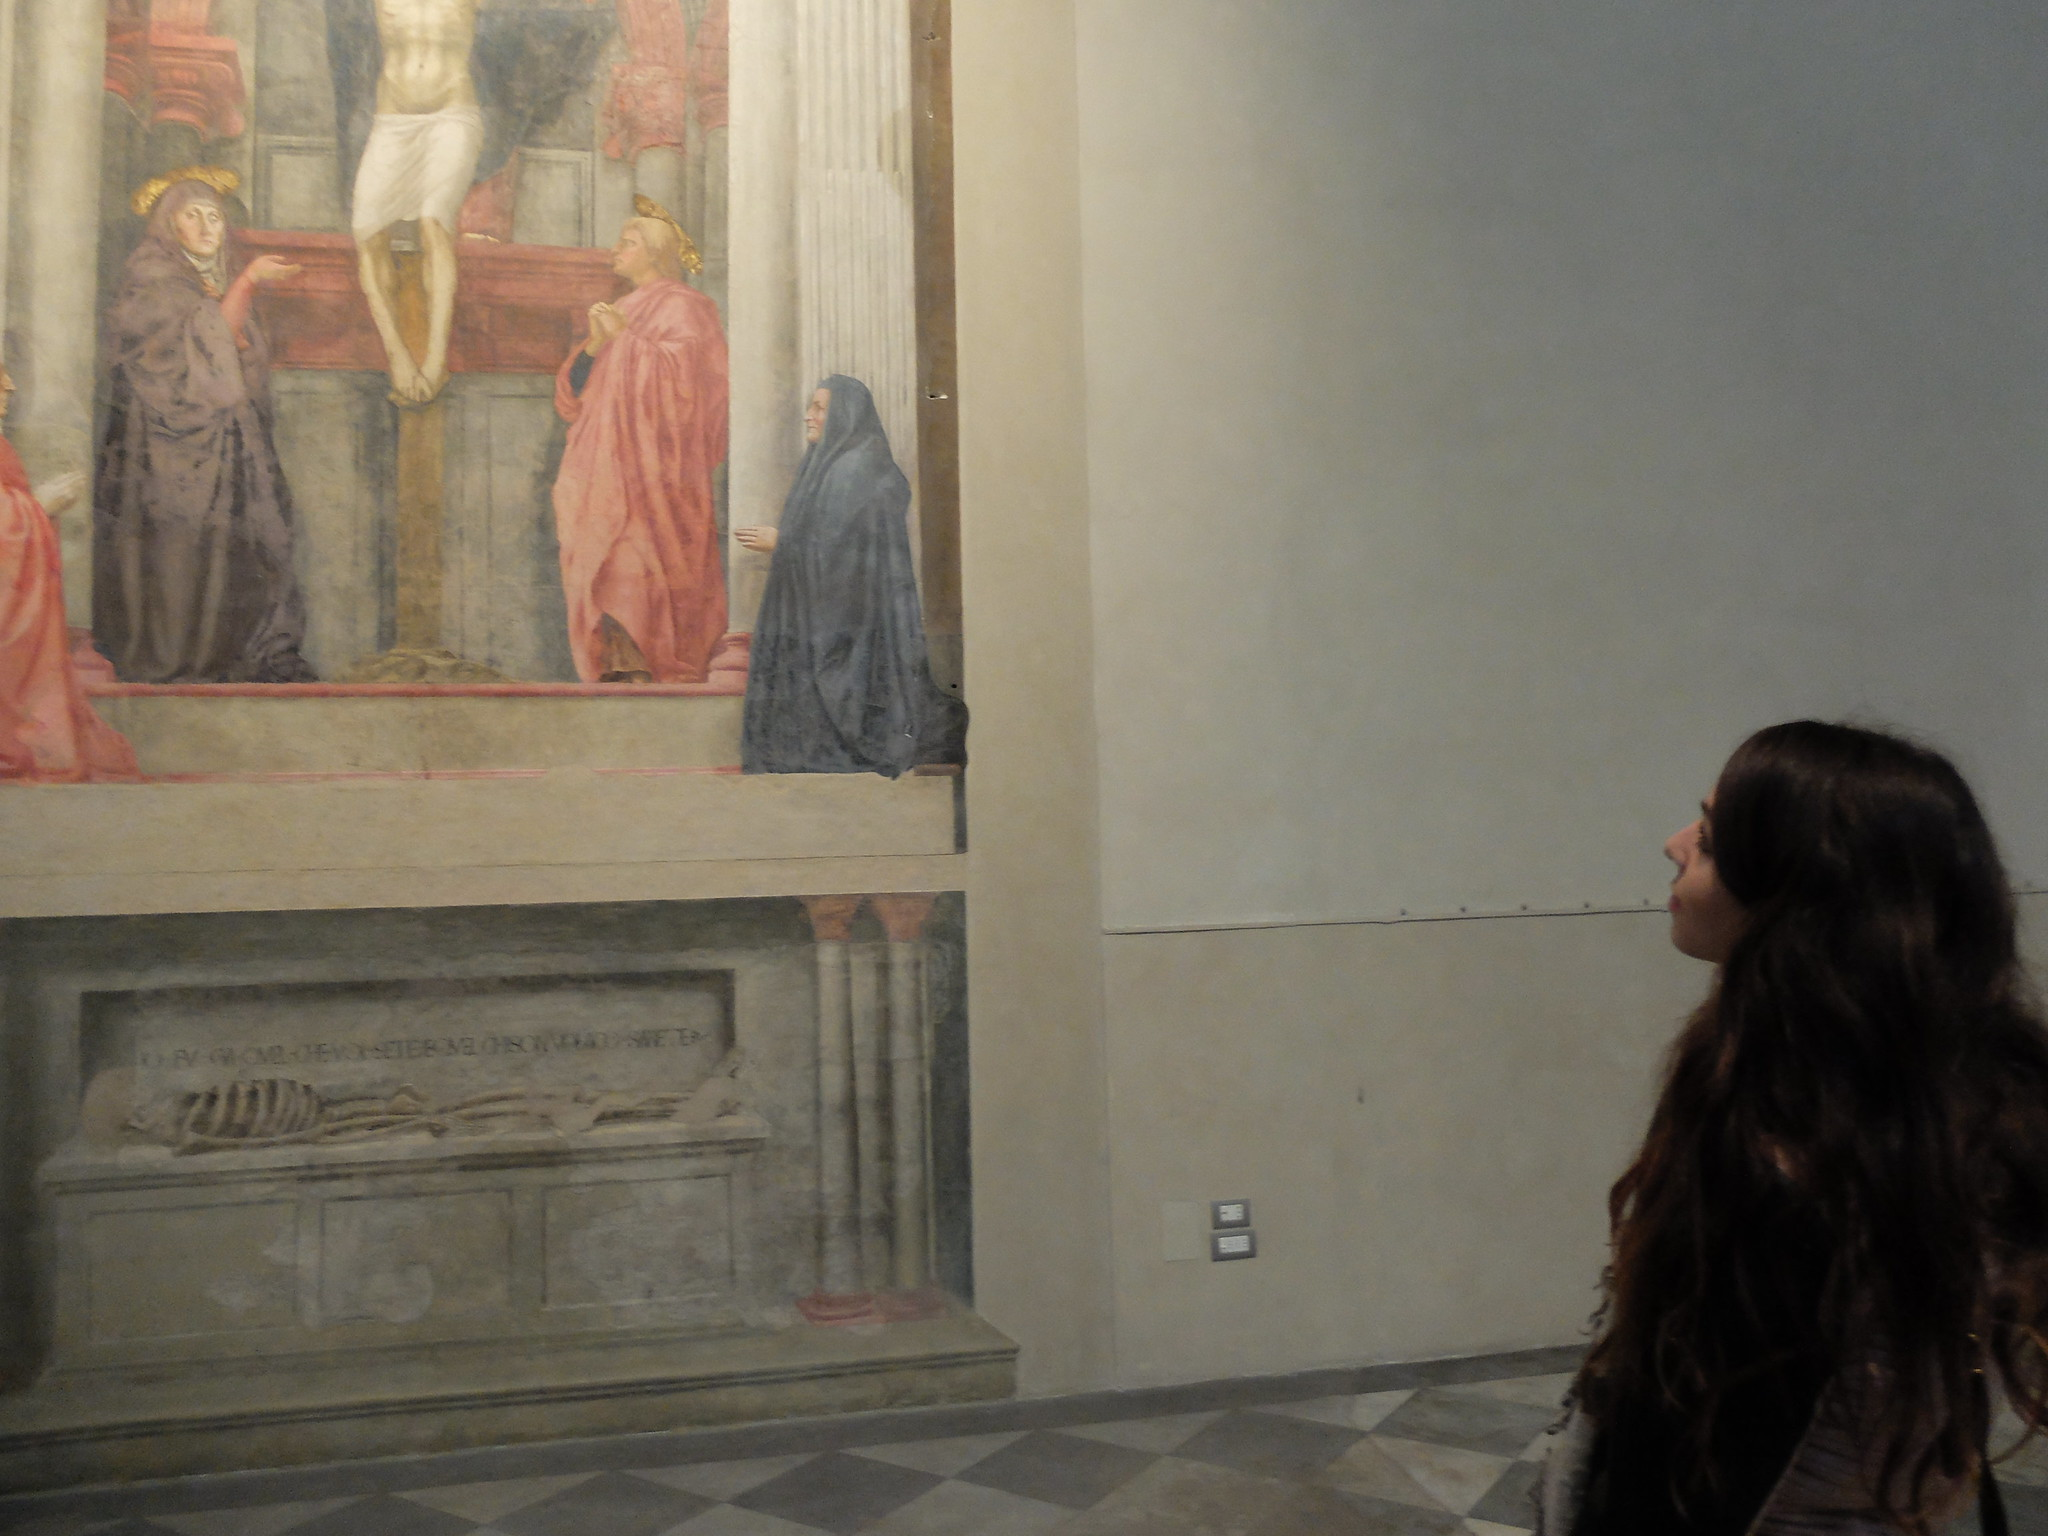 LdM_Internship_Art_Santa-Maria-Novella_Student_20151111_012